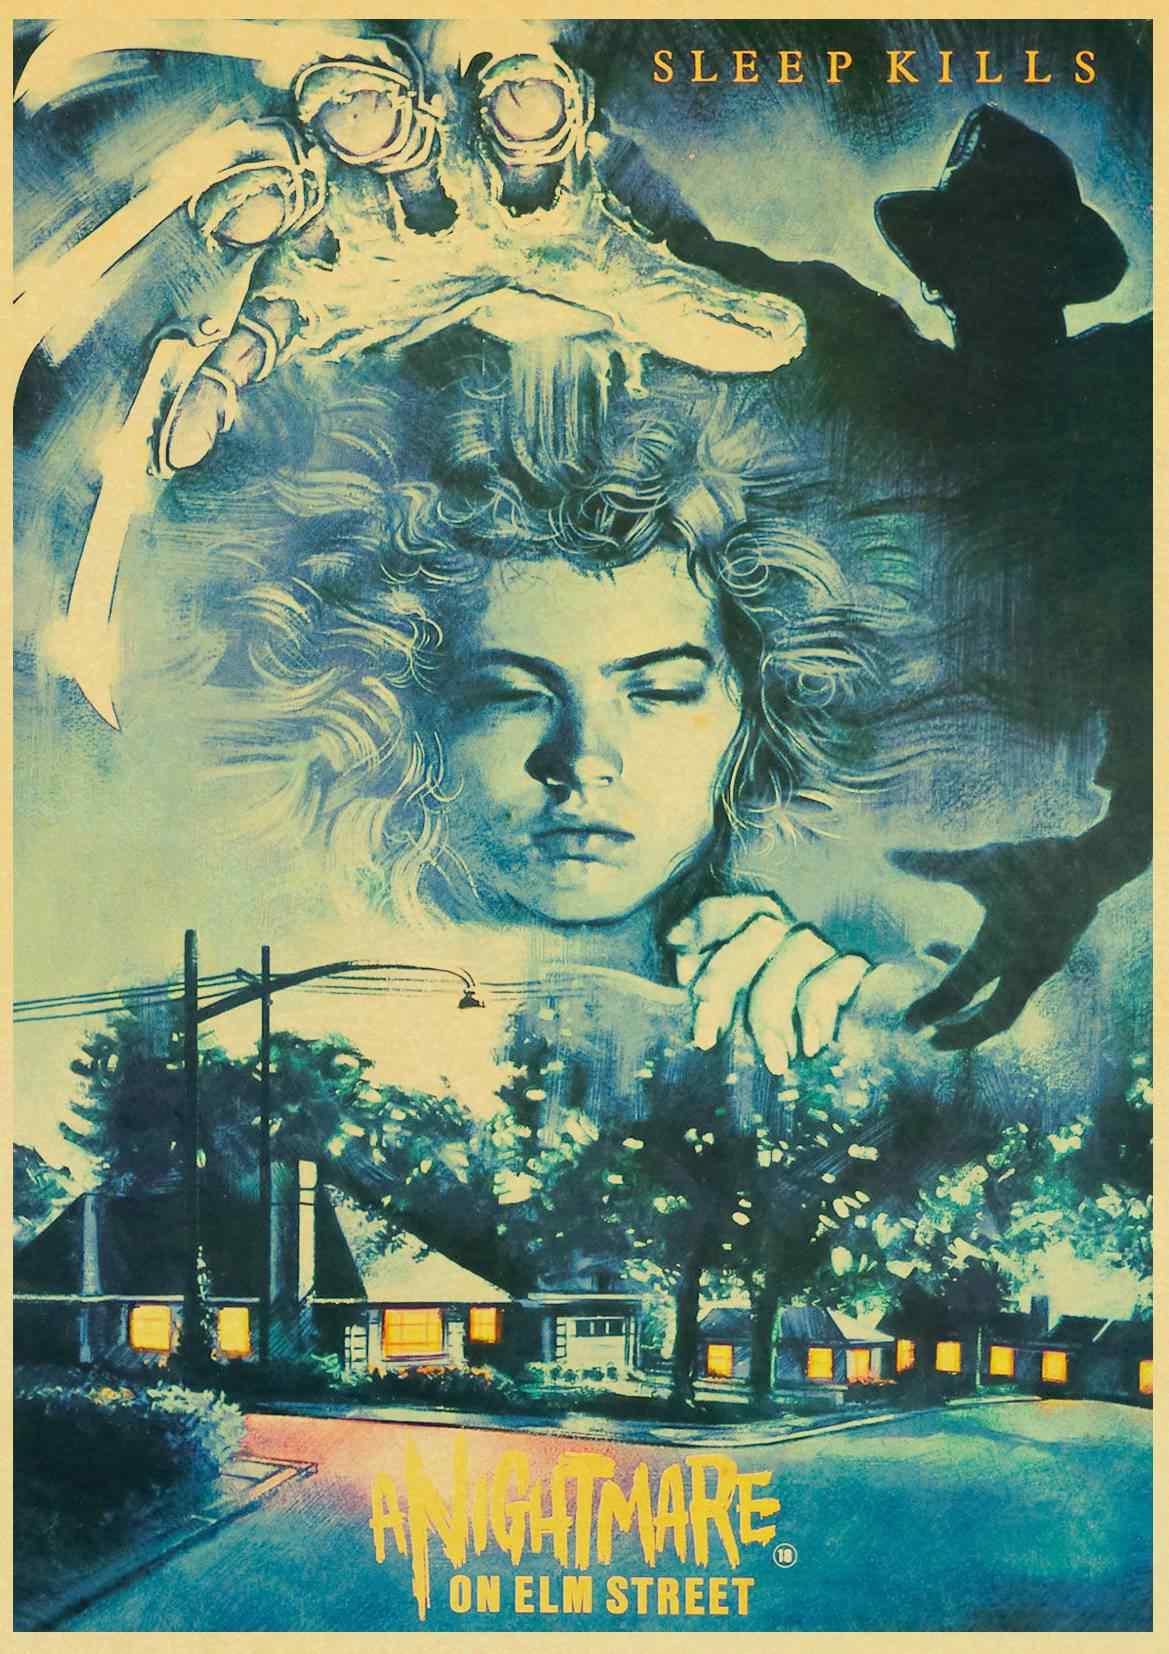 Кошмар на улице Elm плакат фильма/Настенный декор/декоративная живопись/крафт-бумага/Бар плакат/Ретро плакат